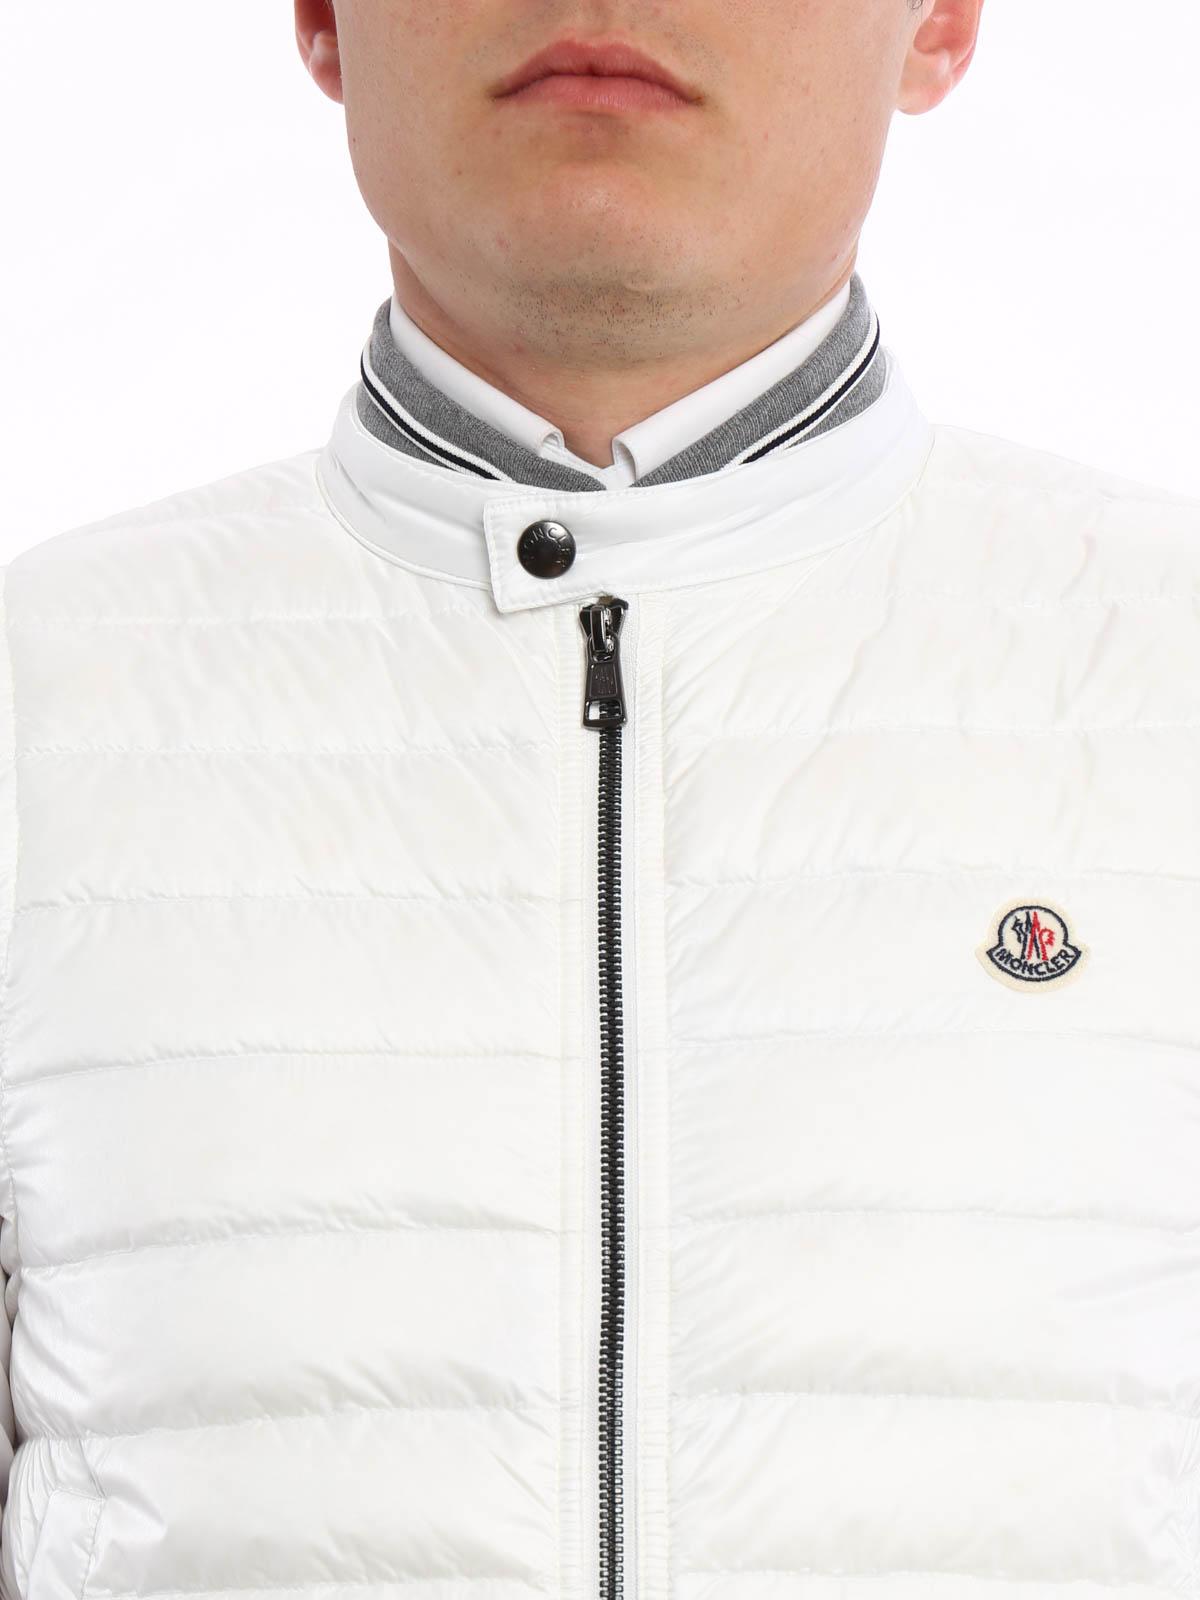 finest selection 363fd f4c10 Moncler - Piumino smanicato - giacche imbottite - B1 091 ...